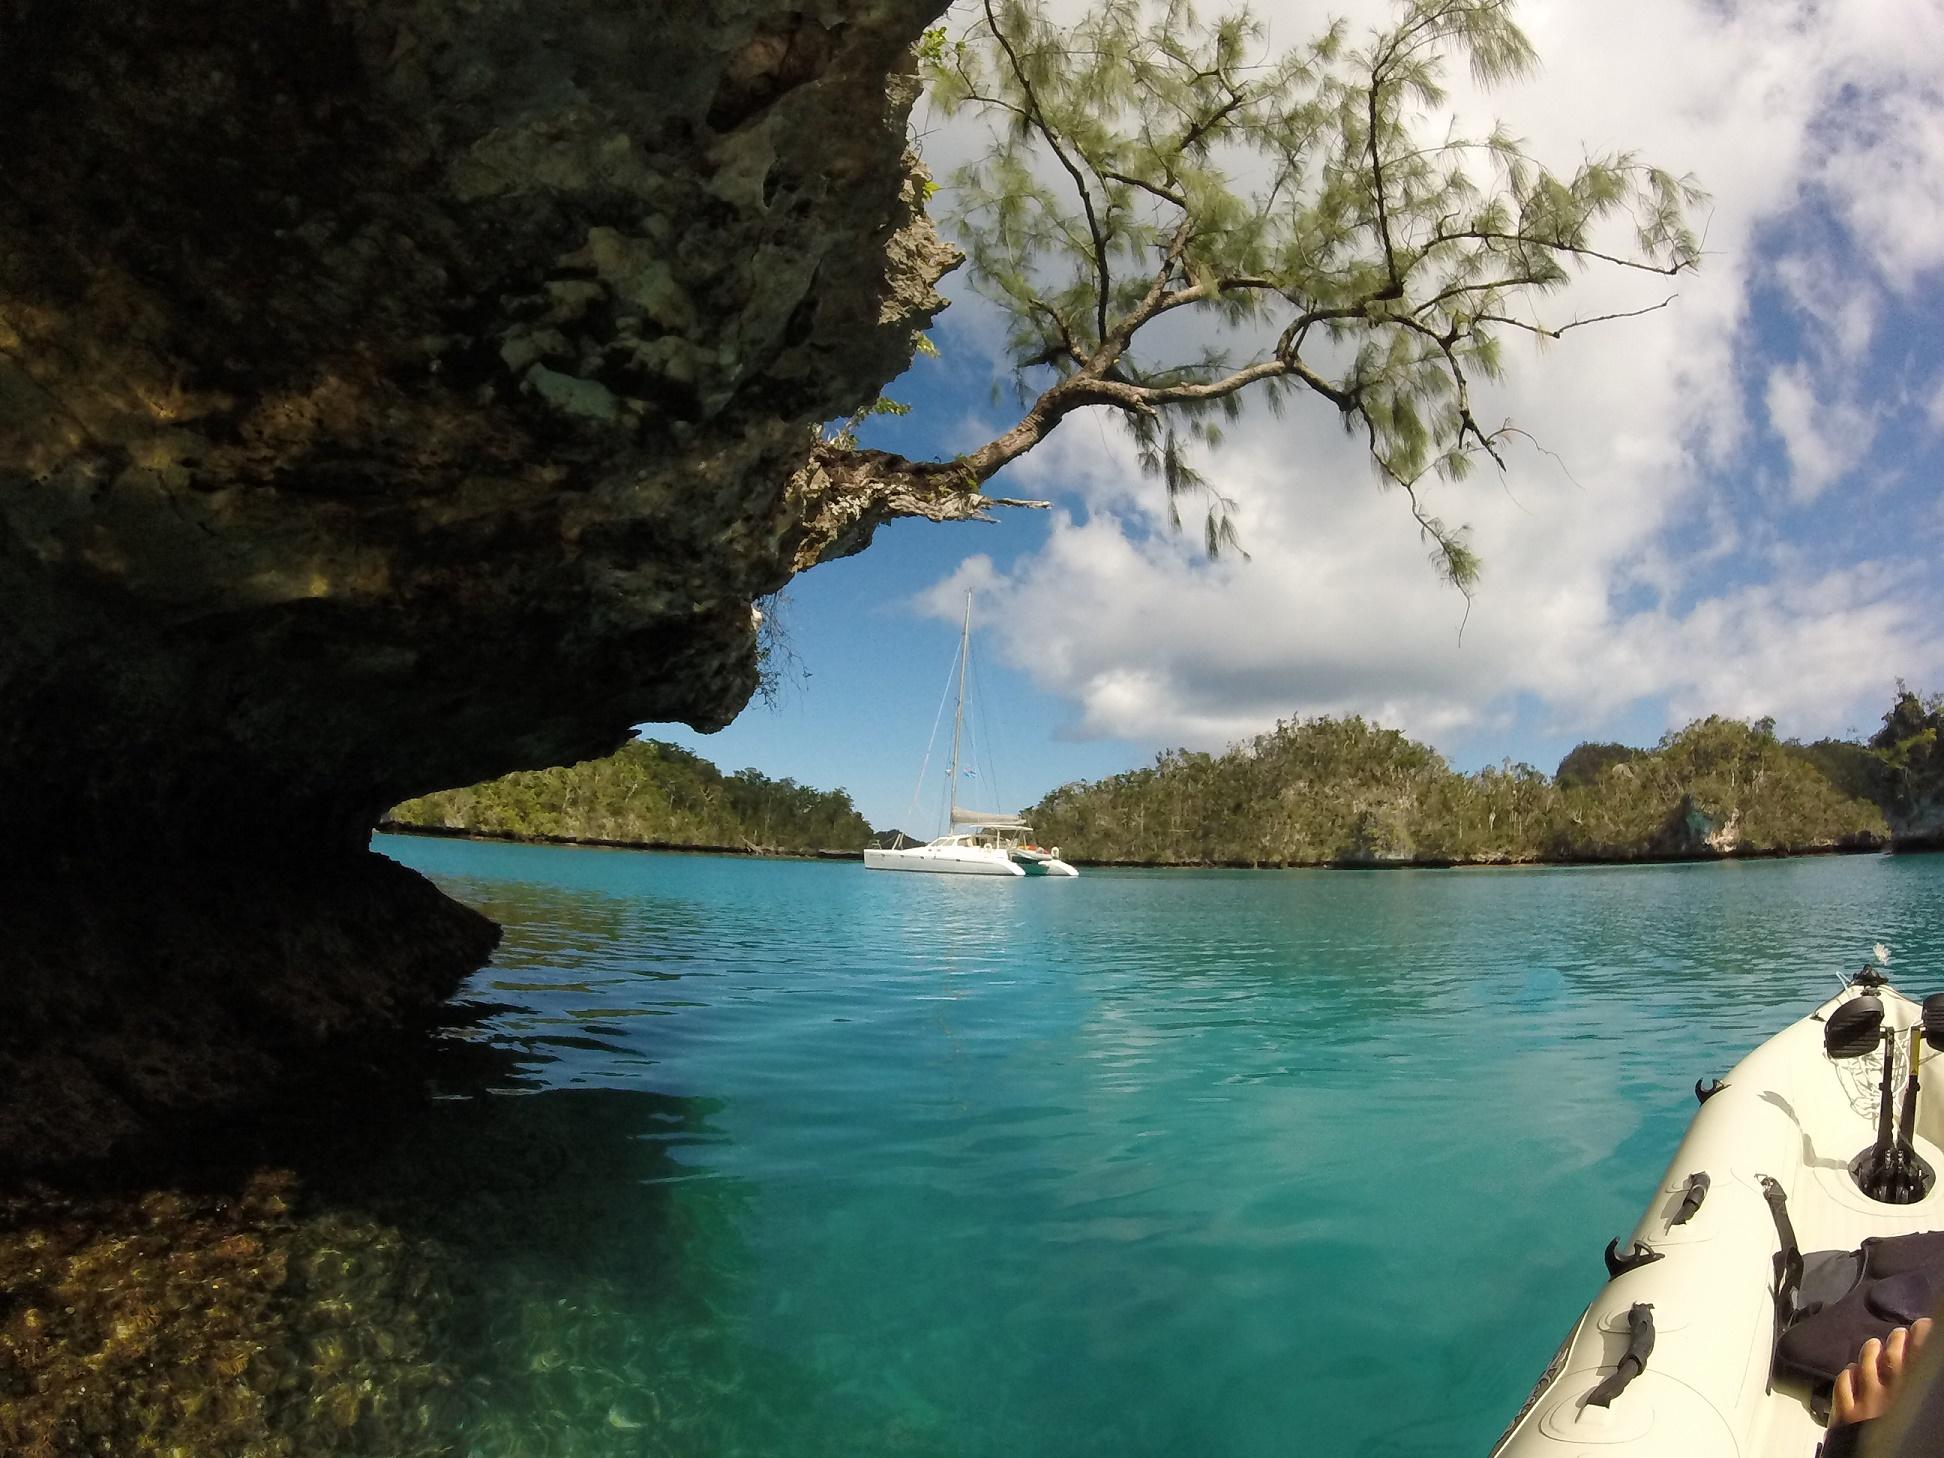 Paradise Found - Vanua Balavu, Fiji